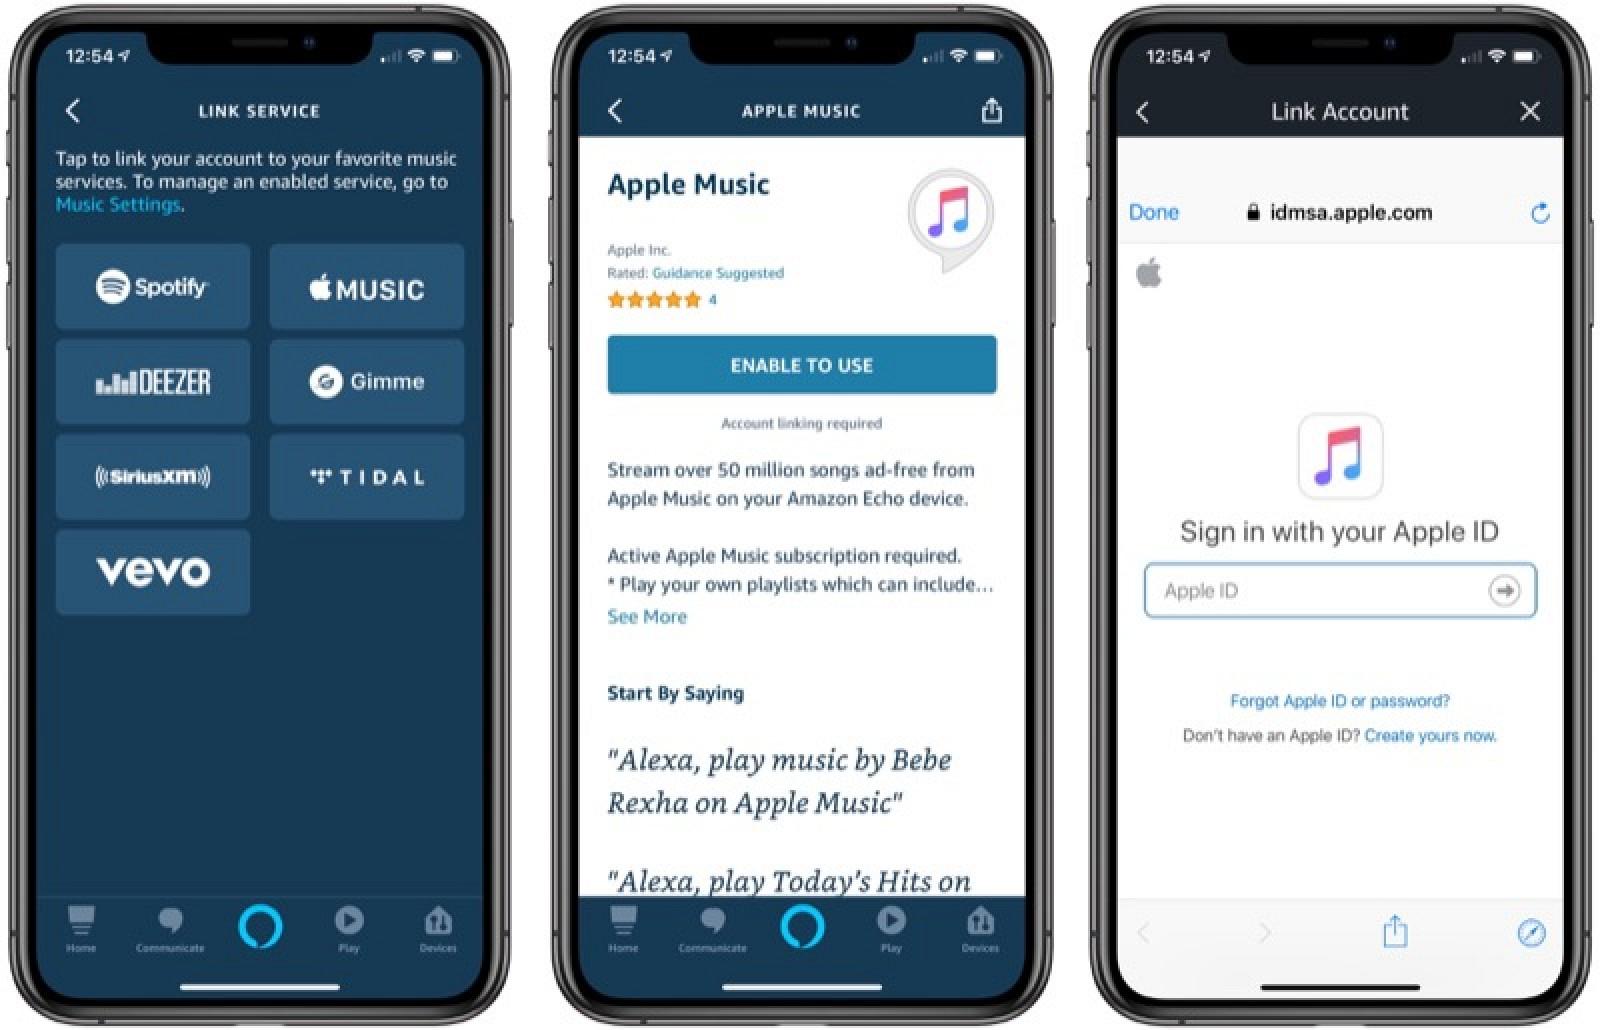 Apple Music Now Playable on Amazon Echo Speakers via Alexa in United